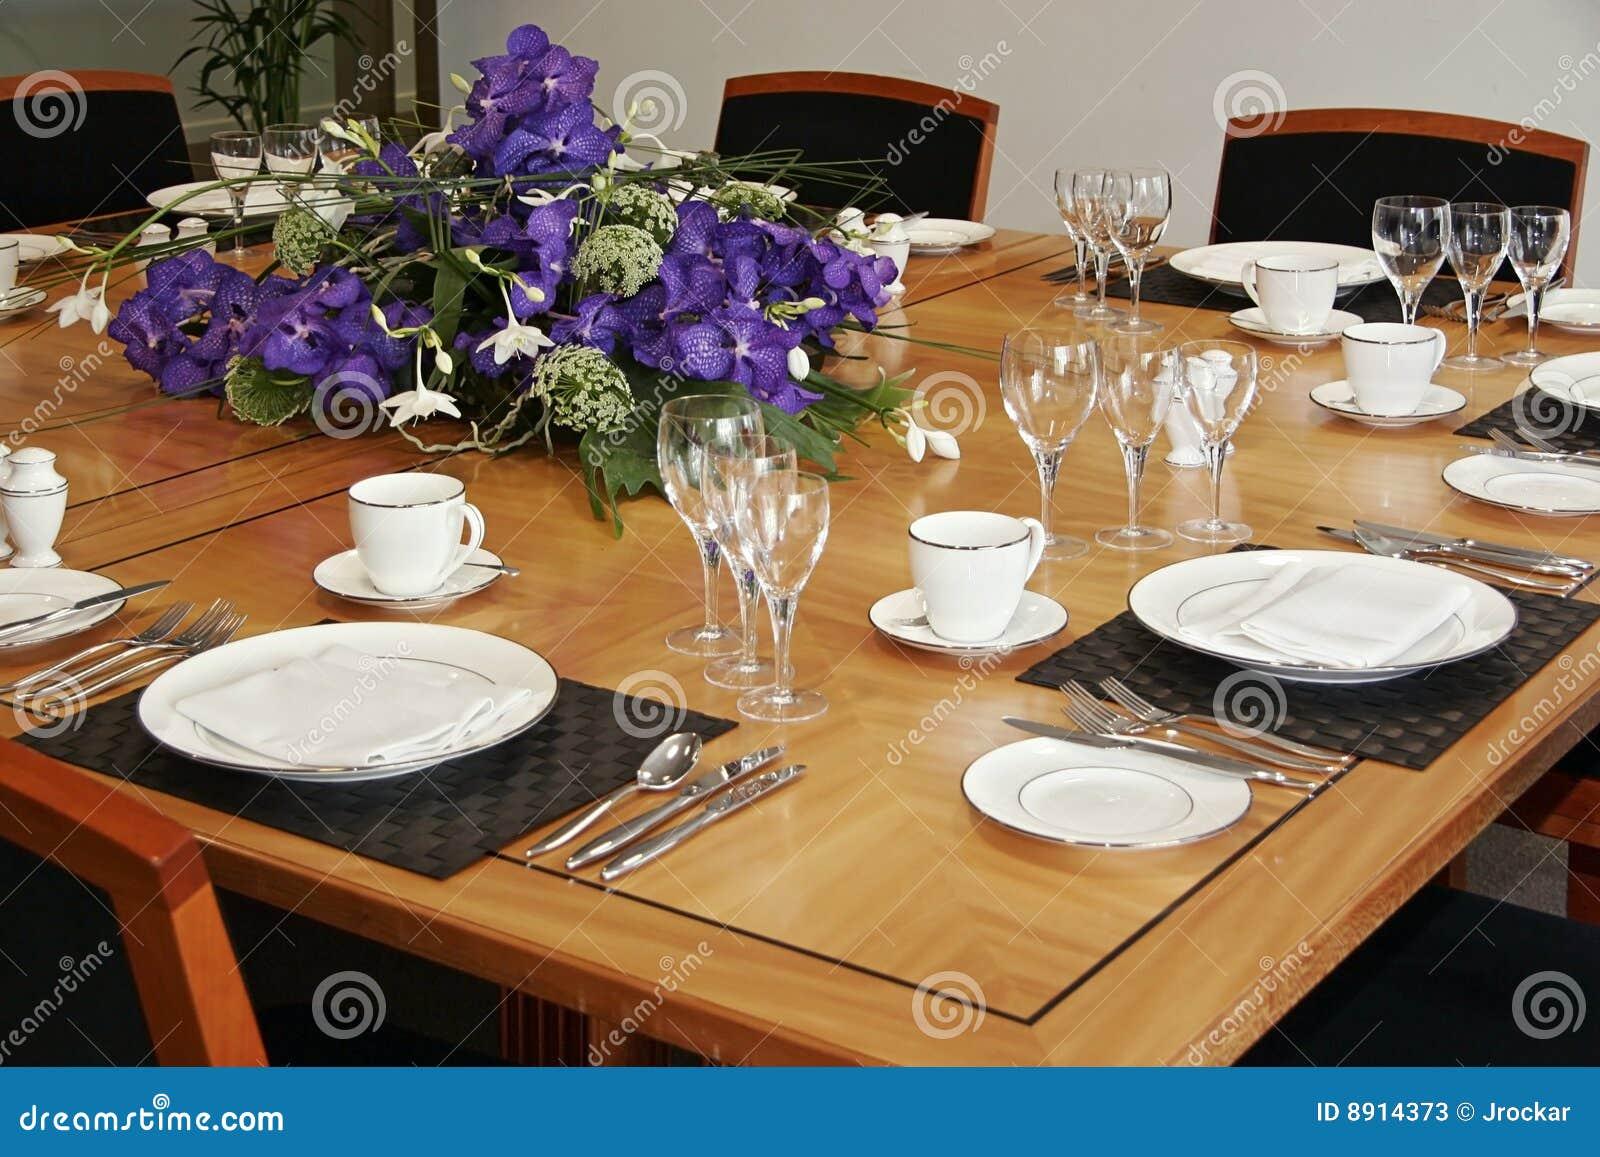 Restaurant Table Setup With Cut Flowers Stock Photos